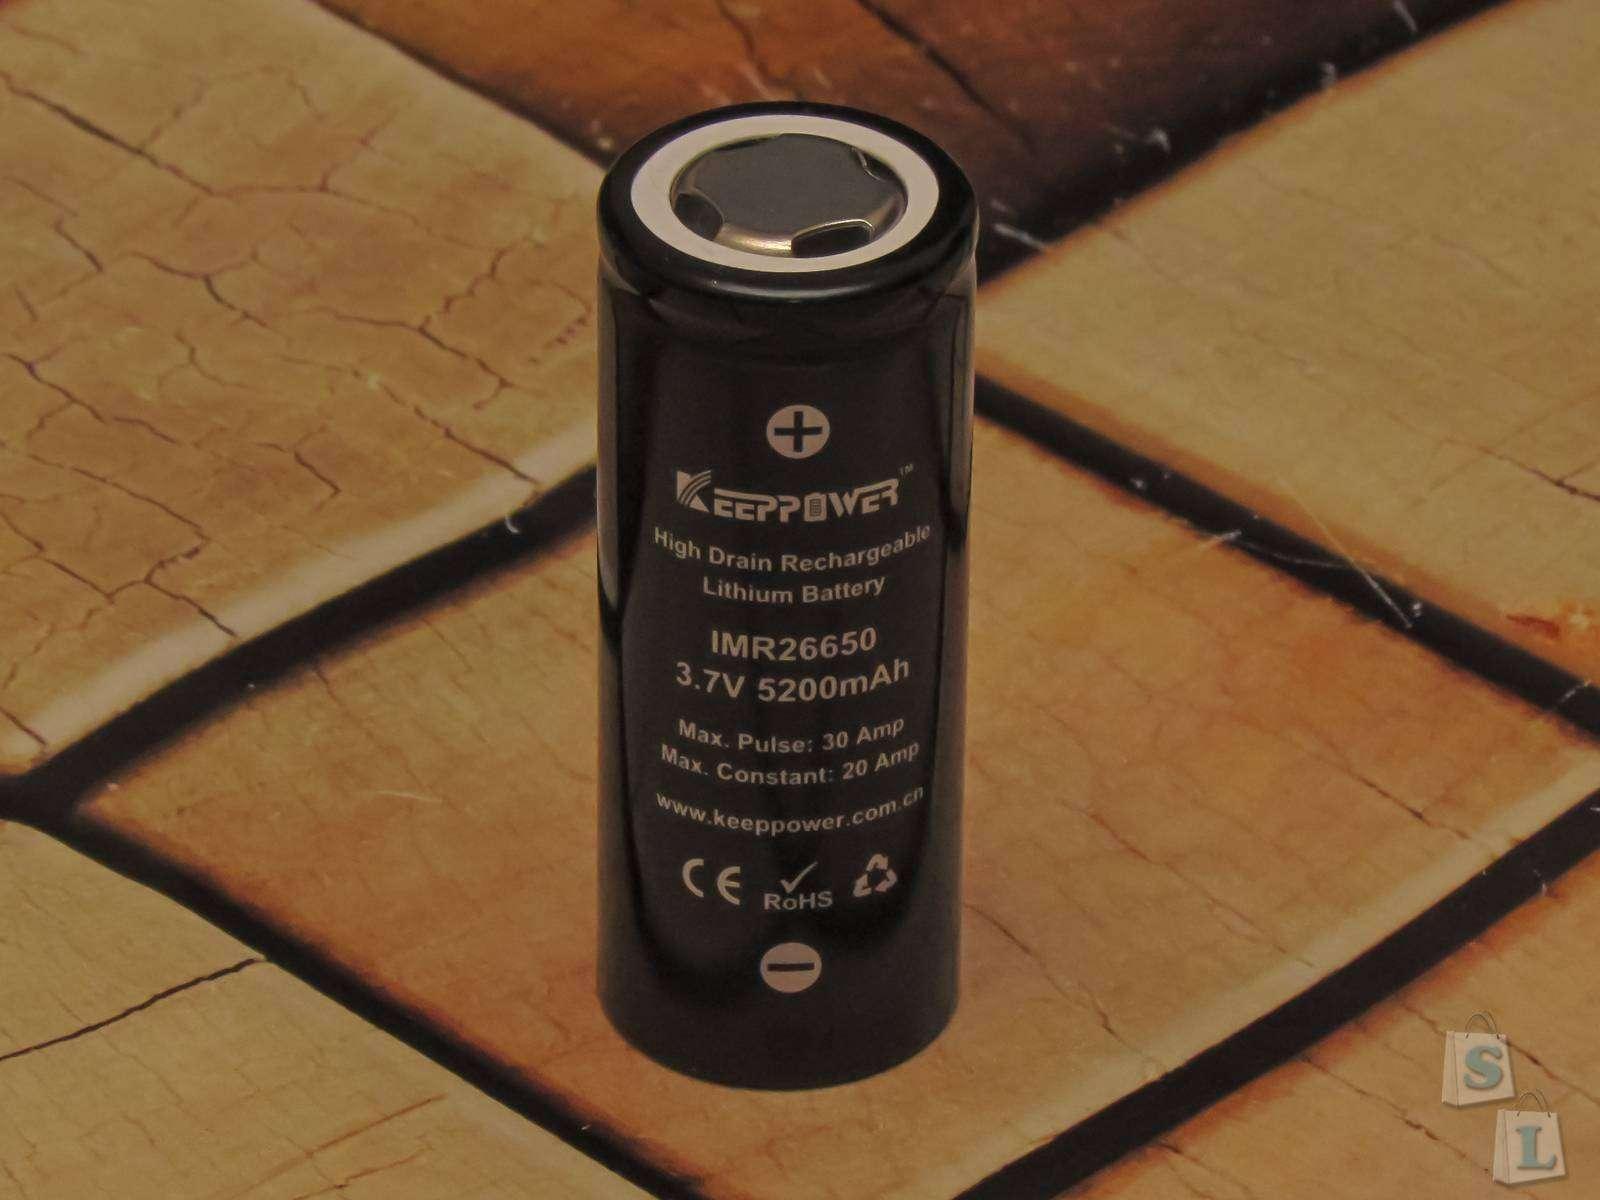 GearBest: Обзор и тестирование Li - ion аккумулятора KeepPower 26650 5200mAh